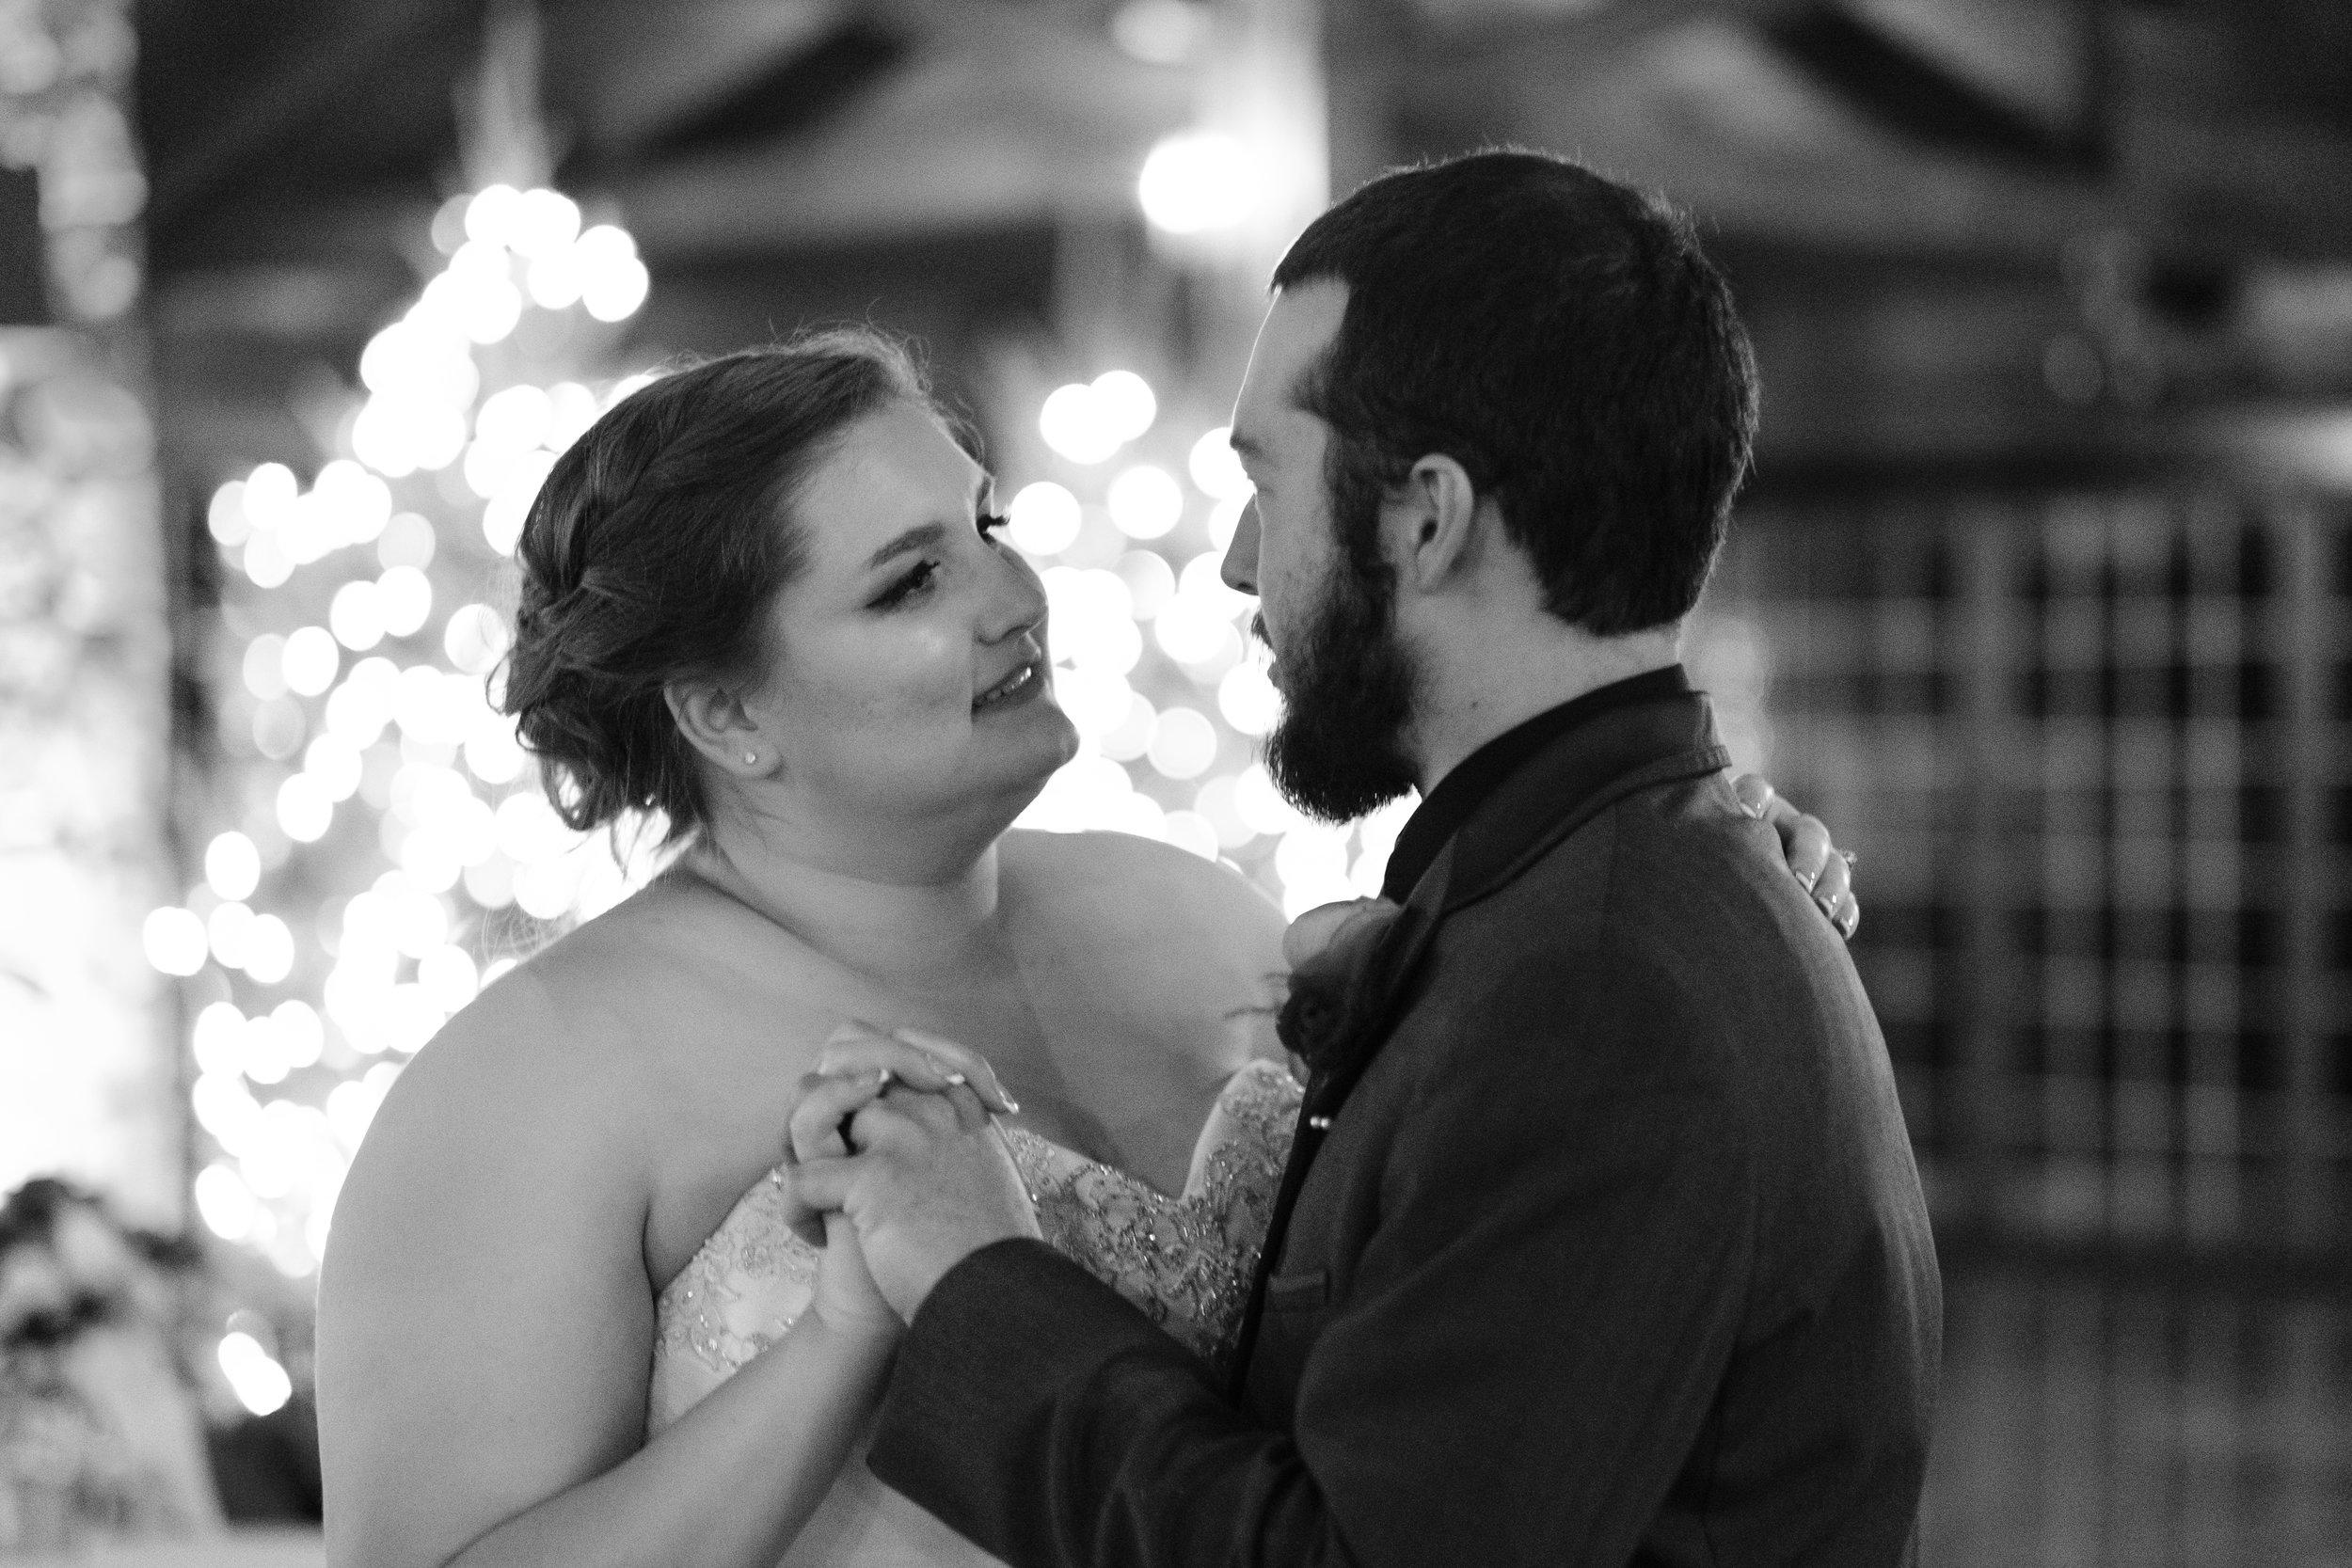 18-12-28 Corinne-Henry-Pavilion-Wedding-529.jpg